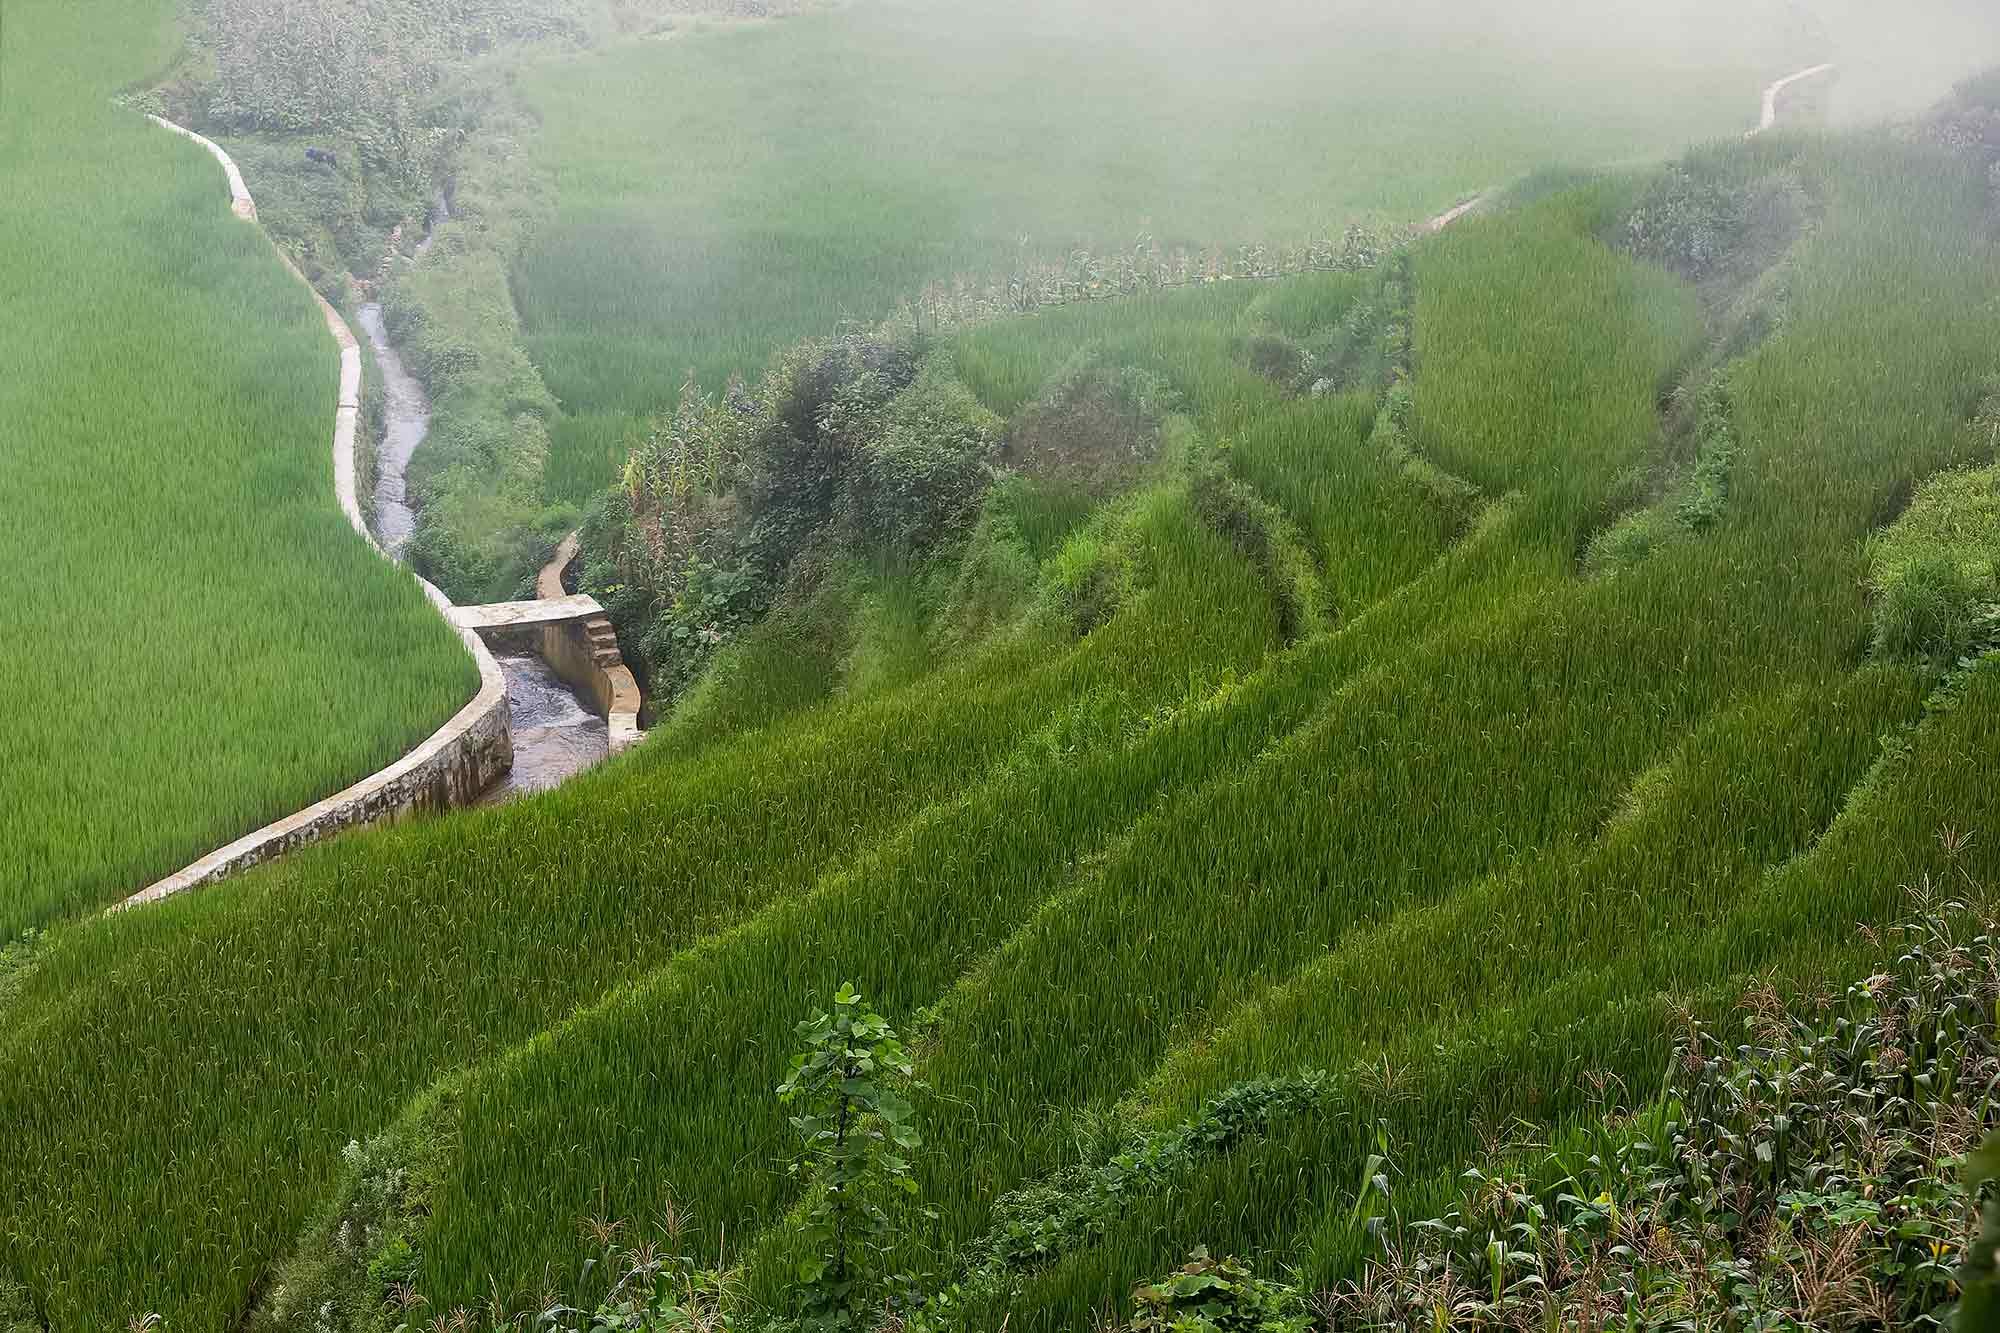 The rice terraces in Duoyishu, Yunnan. © Ulli Maier & Nisa Maier